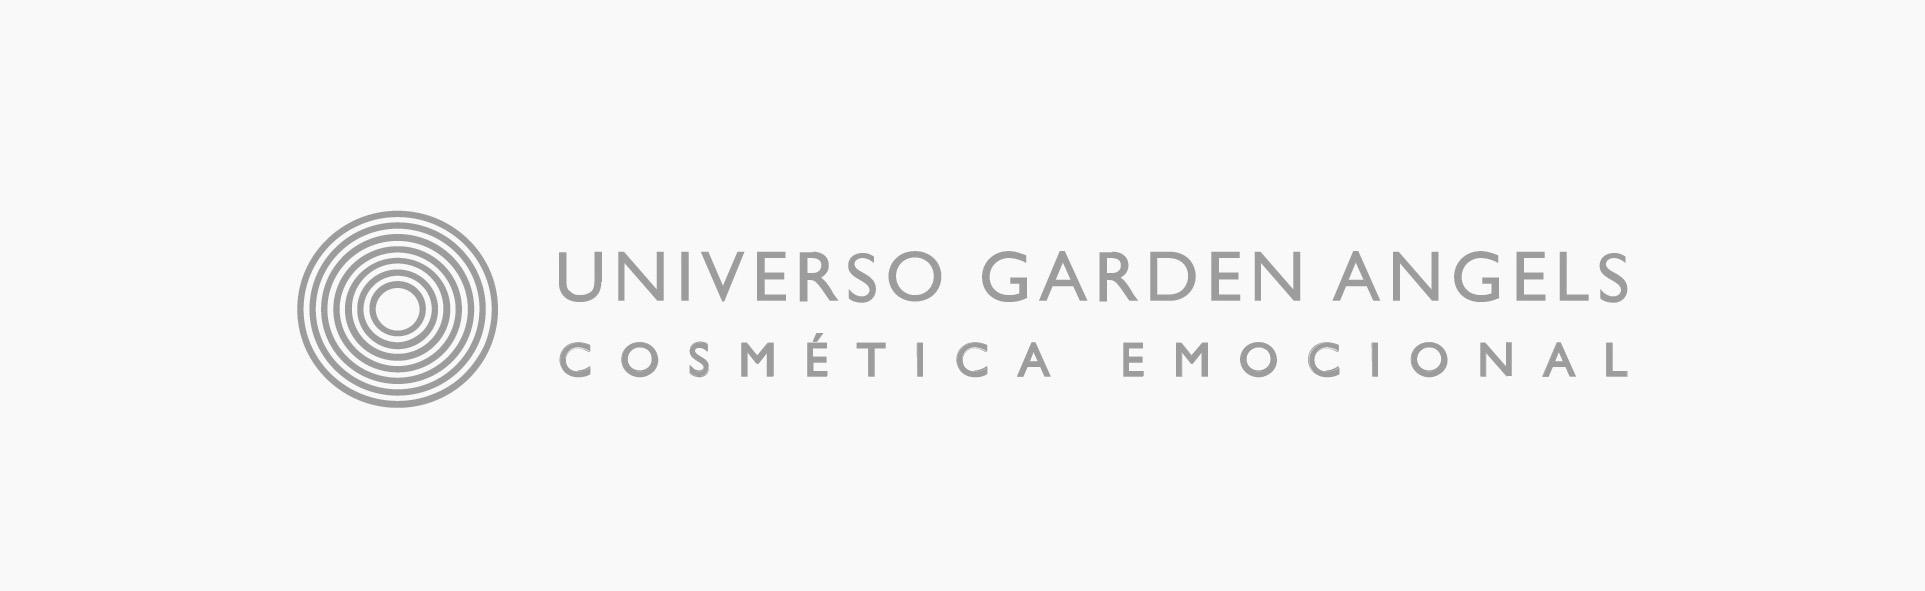 logo-universo-03 copy.jpg